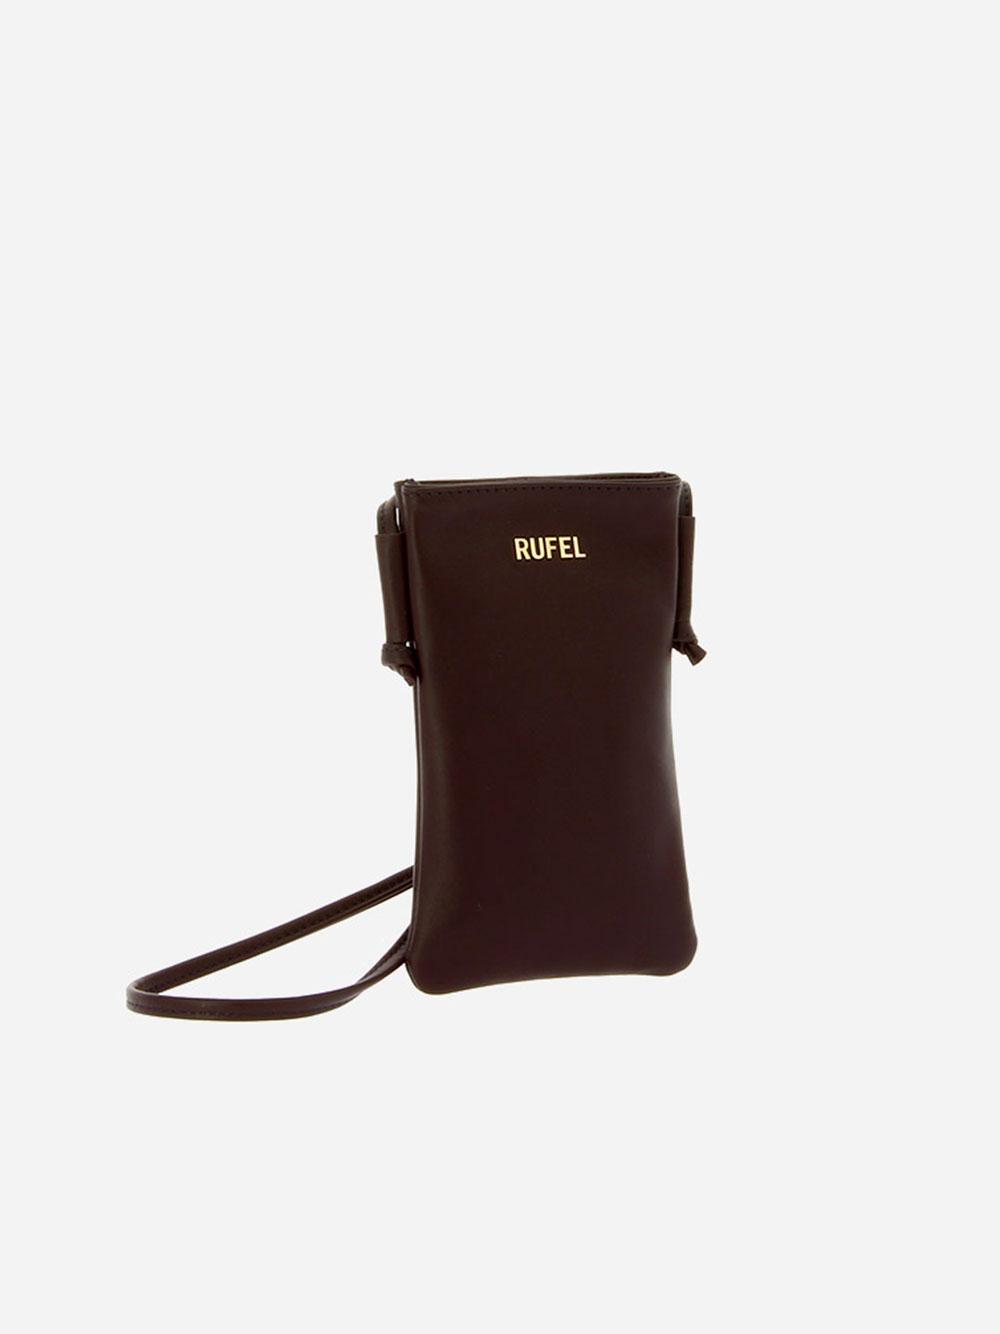 Small Brown Crossbody Bag